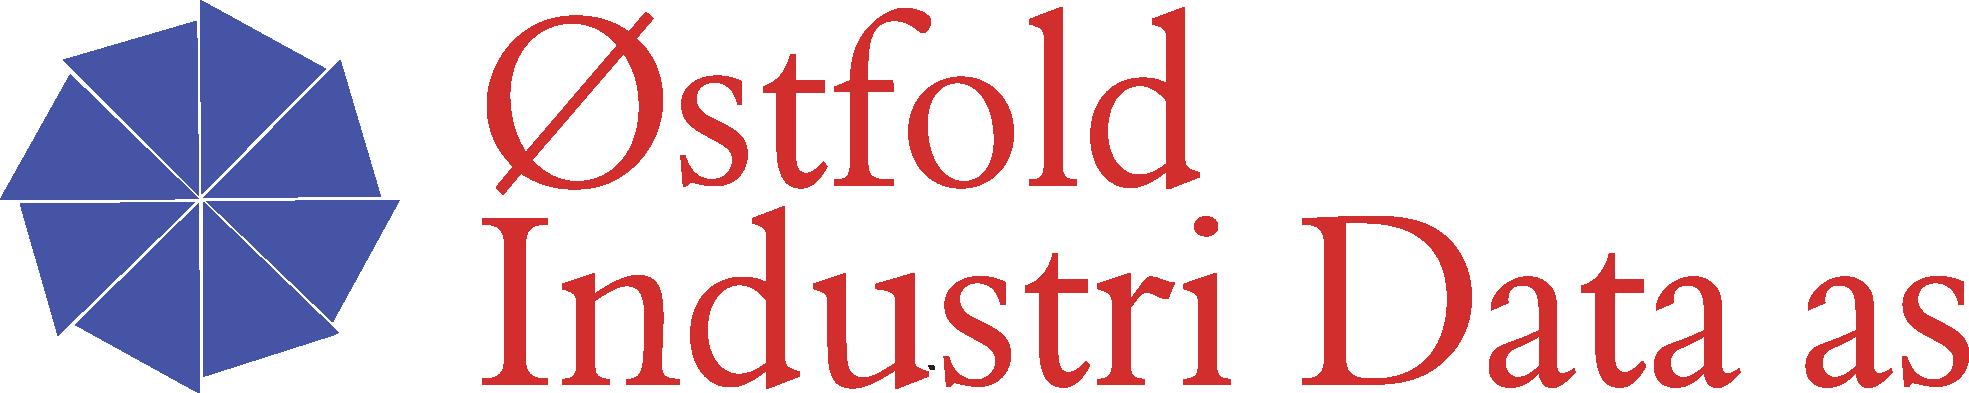 Østfold Industri Data AS